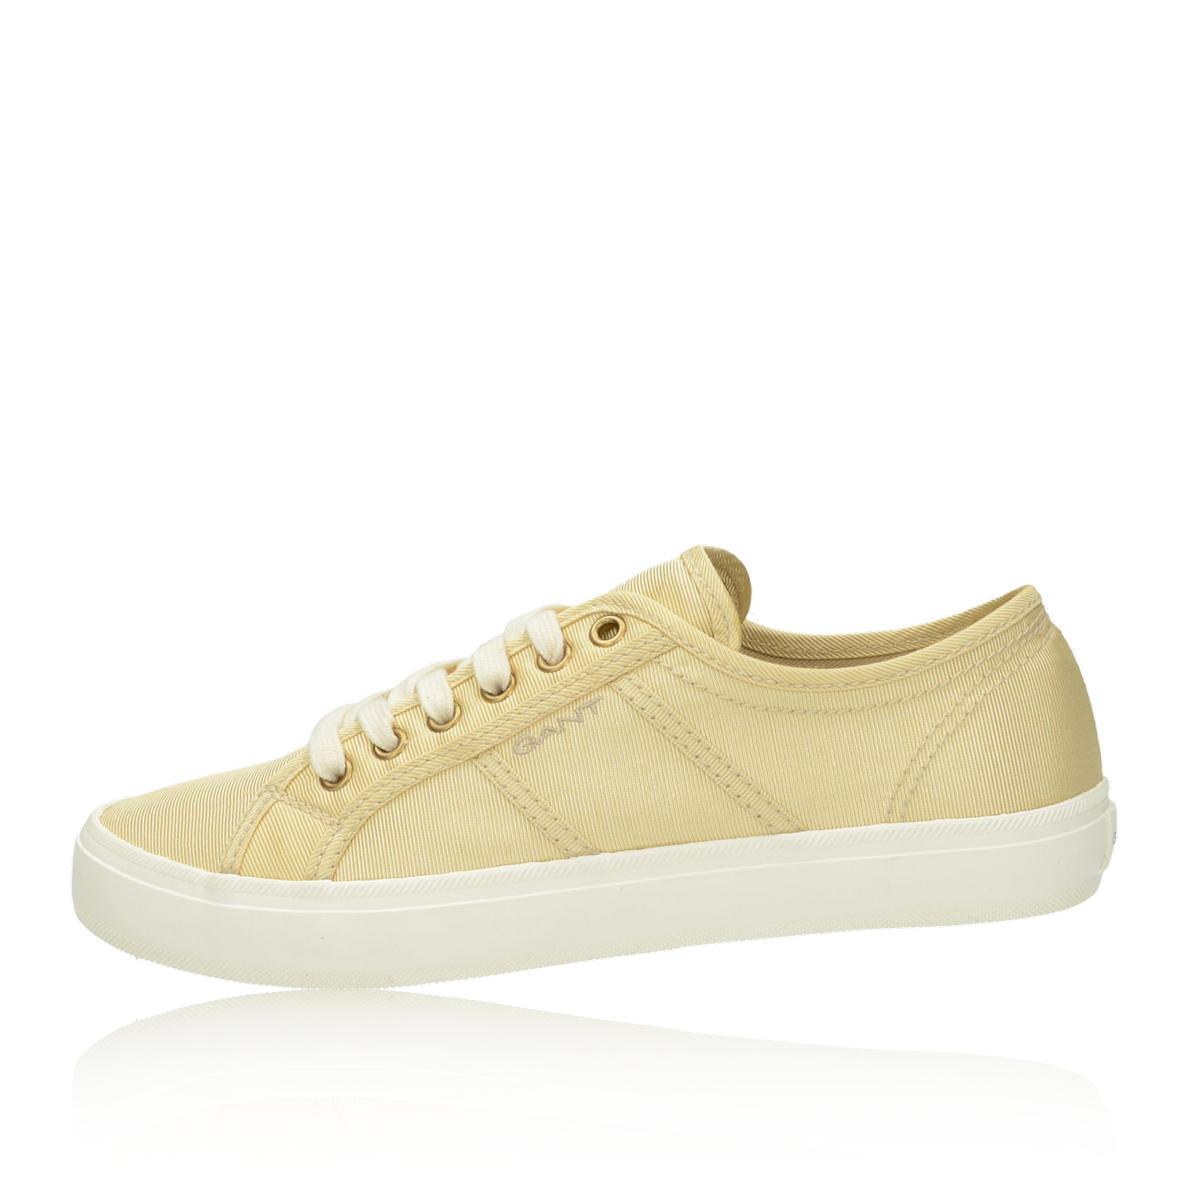 99c8fff210 Gant dámske tenisky - žlté Gant dámske tenisky - žlté ...